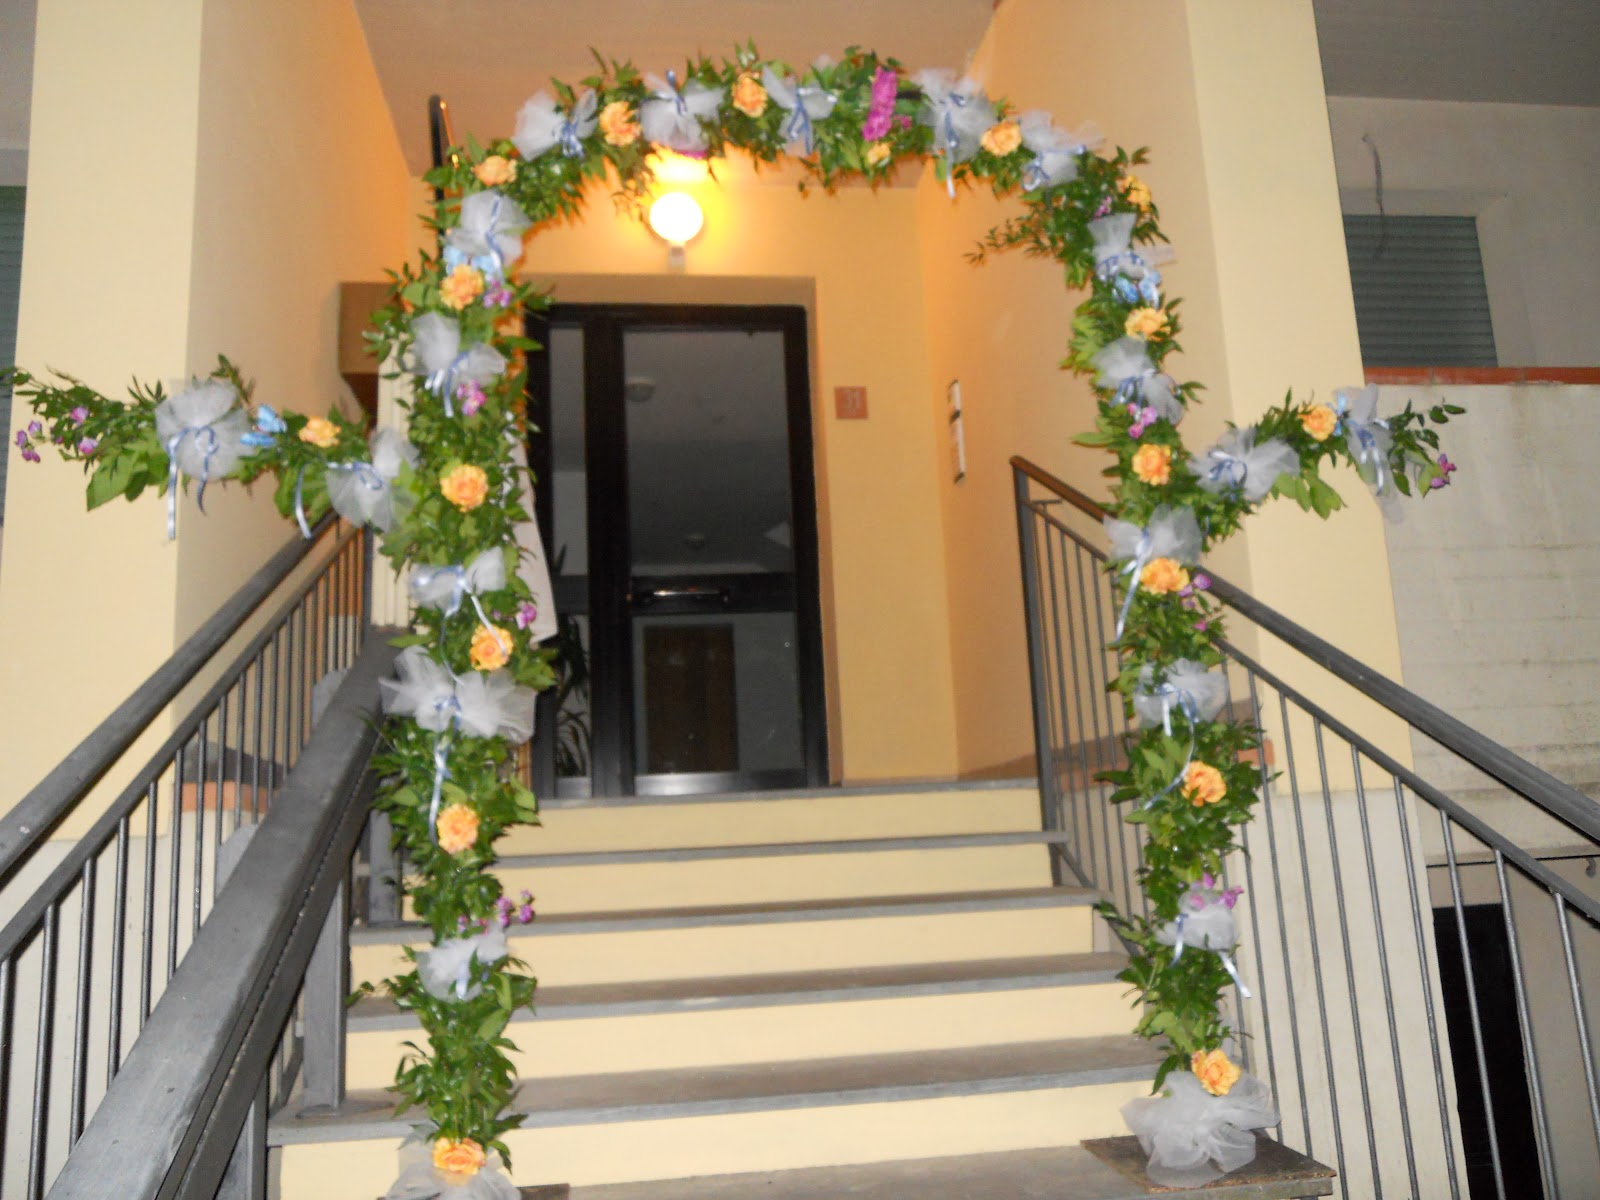 Forever wedding planner matrimonio 21 luglio 2012 prima parte - Addobbi floreali casa sposa ...